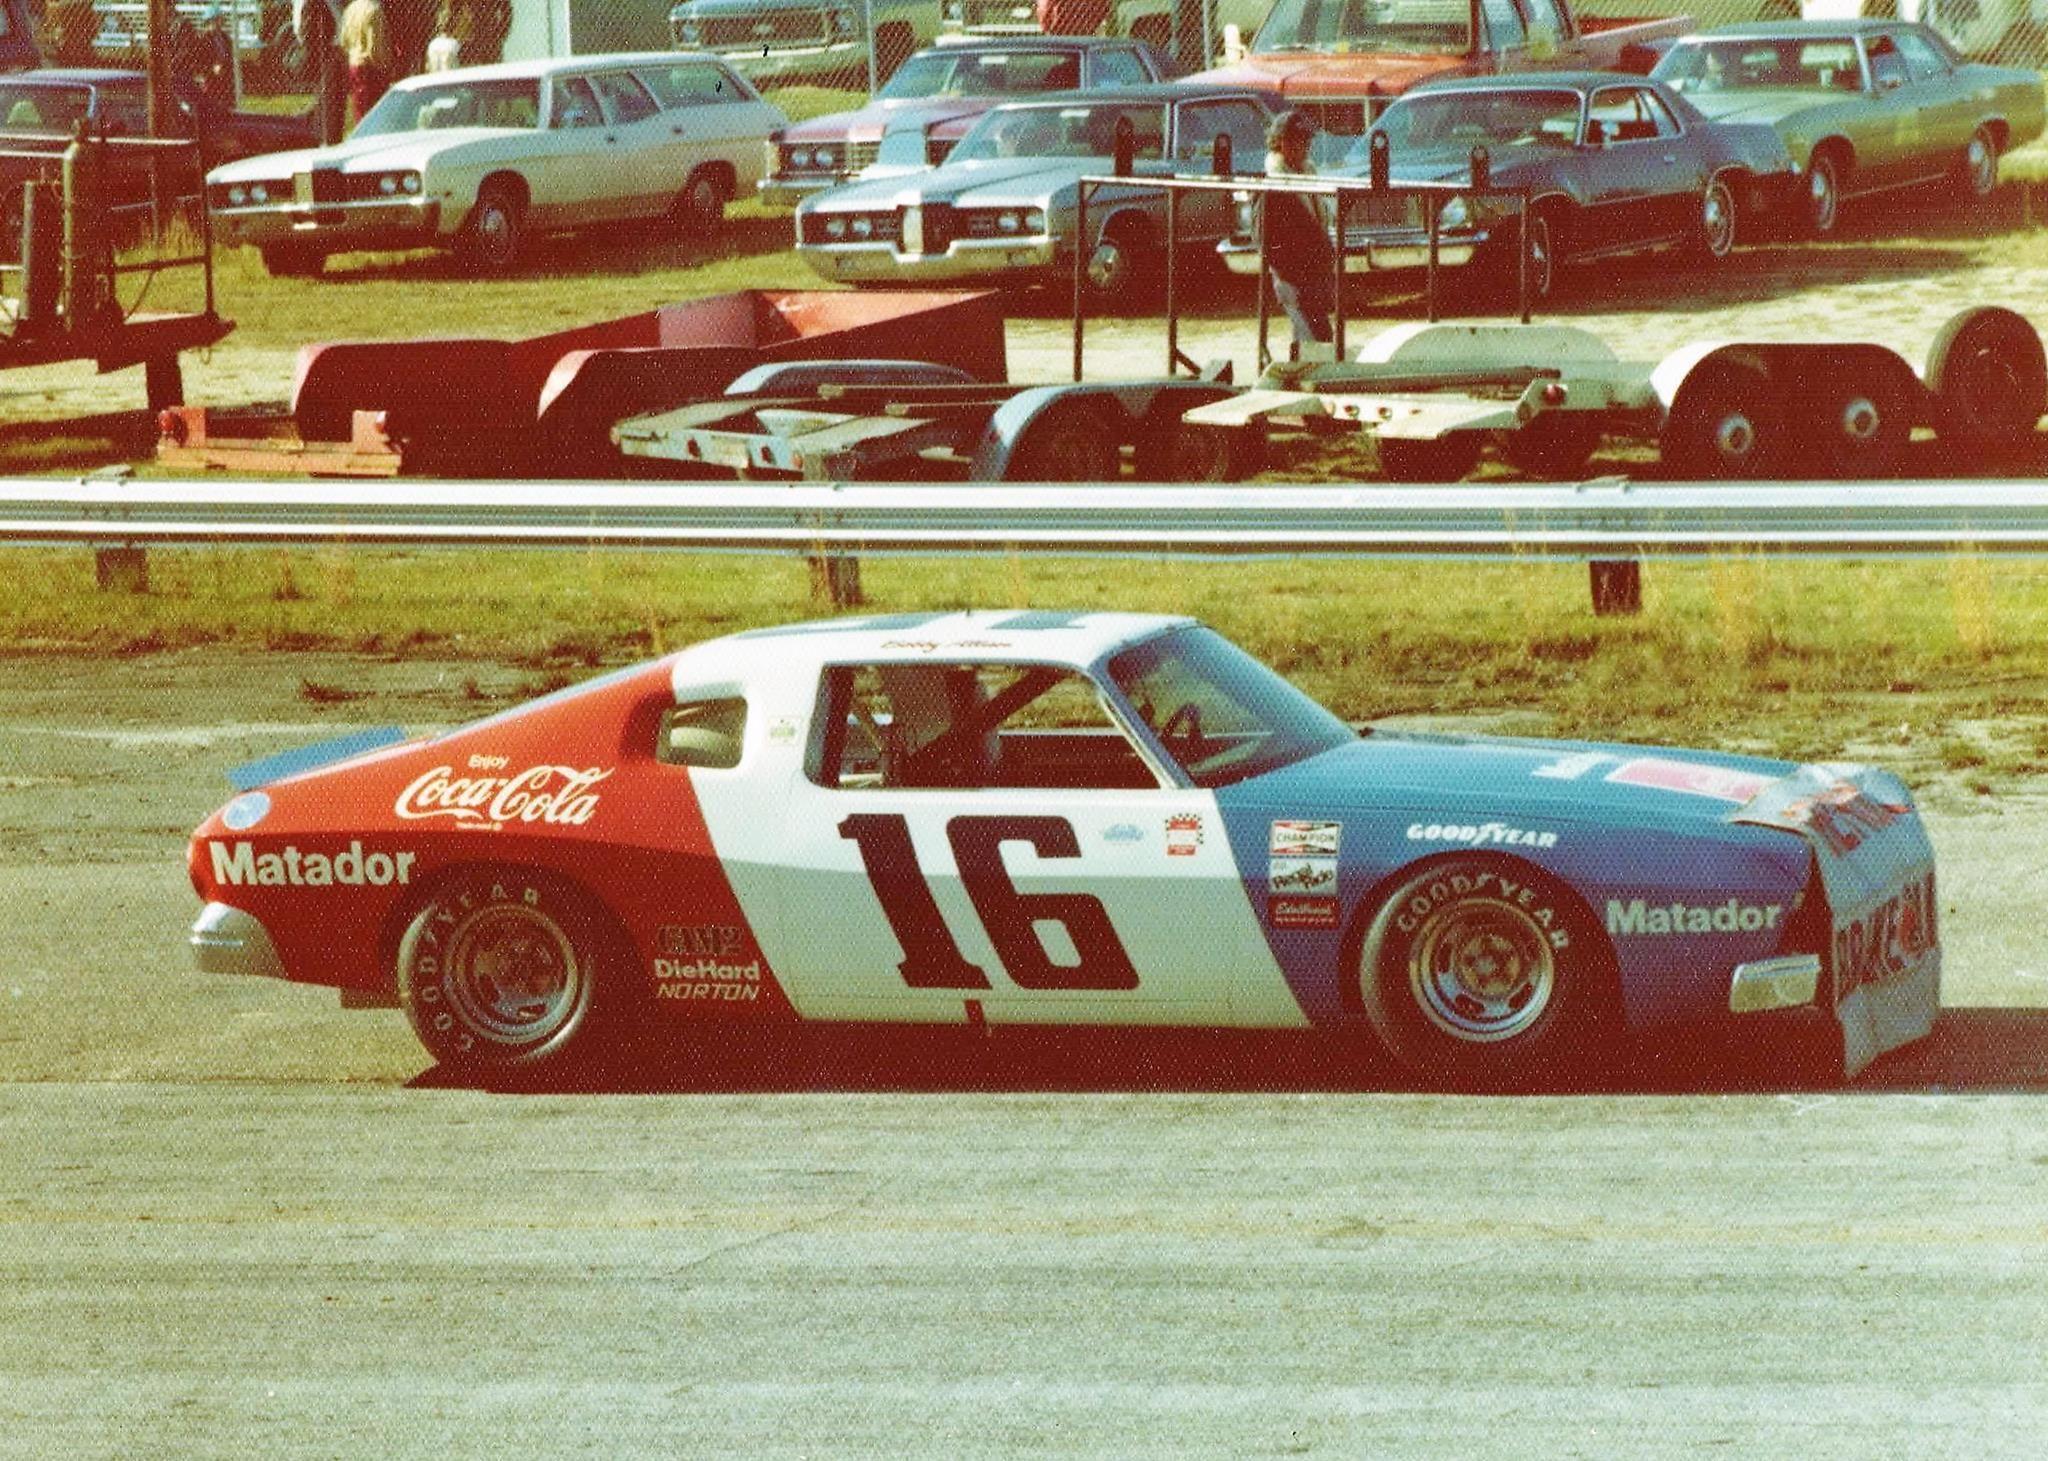 Bobby Allison PENSKE Matador Darlington 1975